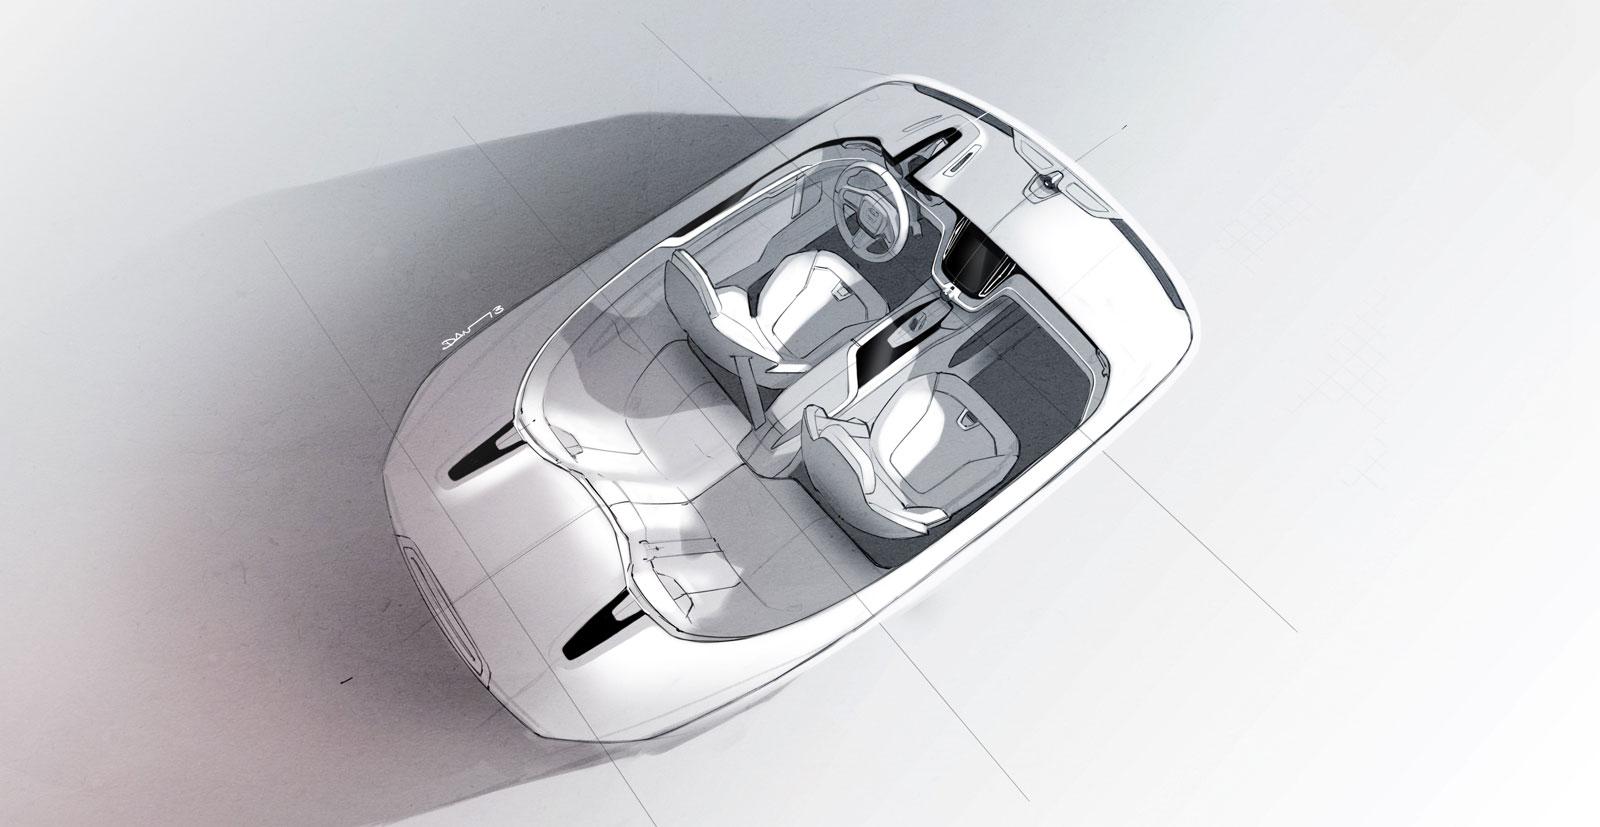 volvo concept coupe interior design sketch car body design. Black Bedroom Furniture Sets. Home Design Ideas